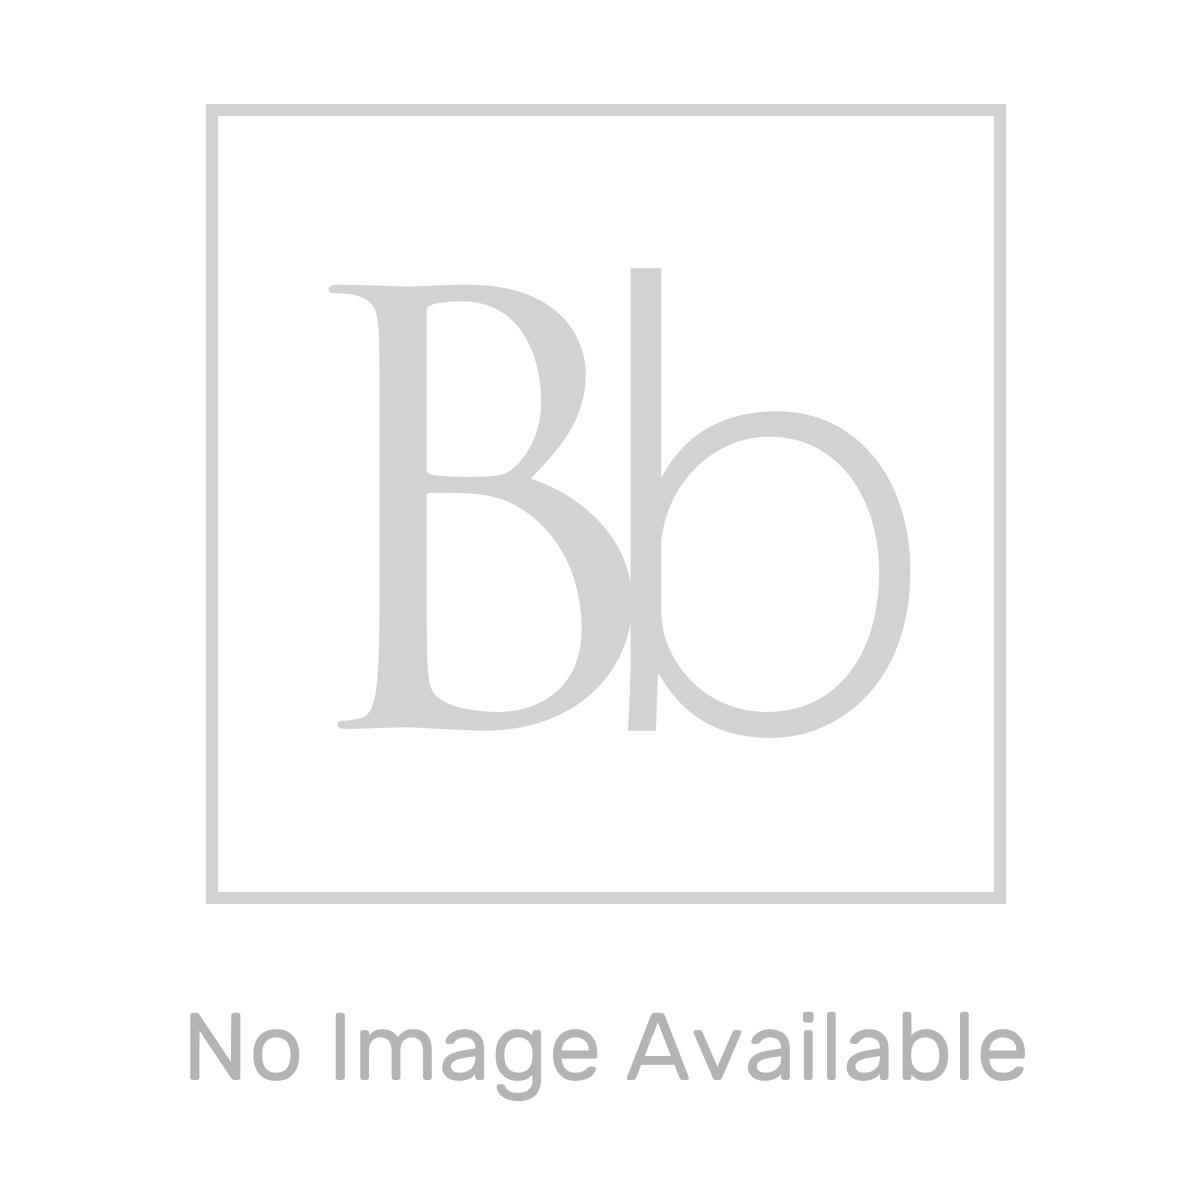 Moods Cascade Supercast Double Ended Whirlpool Bath 1700mm